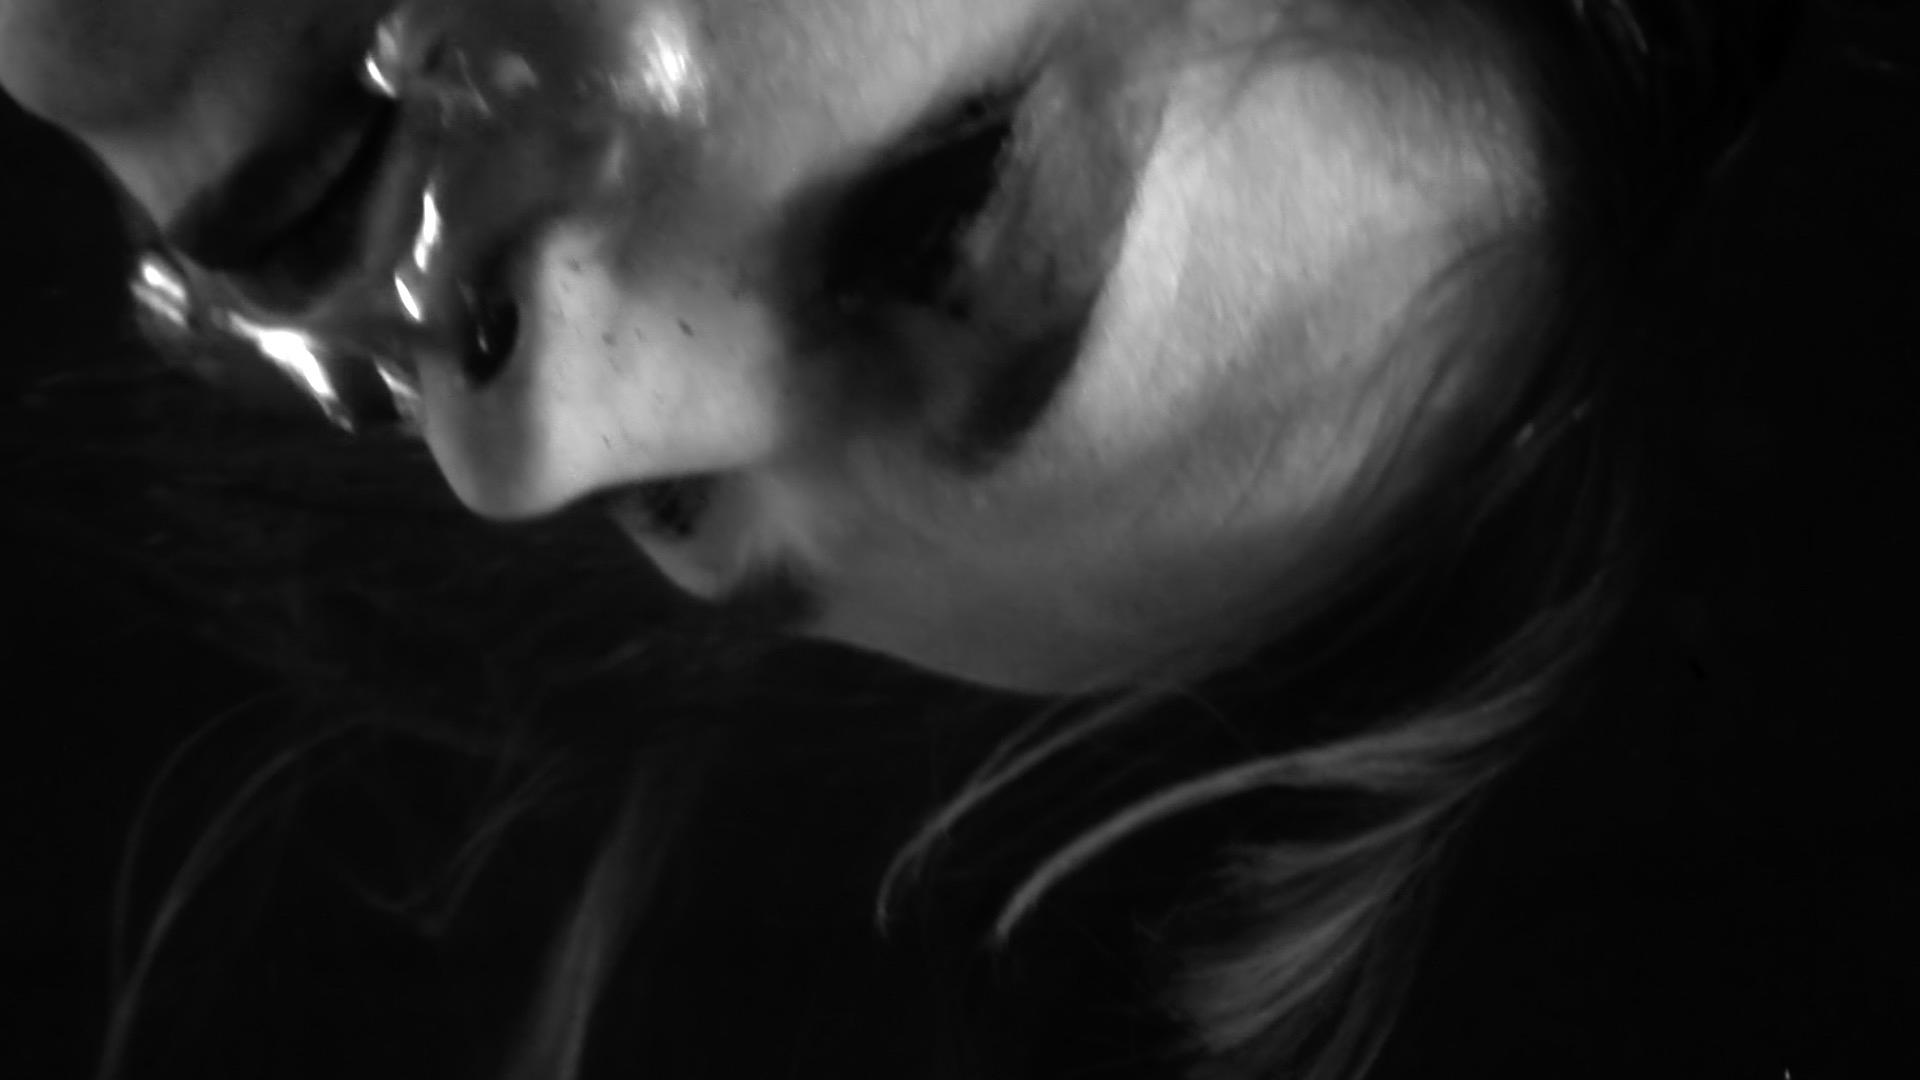 Fever-Milo-Joki-Tournage-clip-vidéo-paca-Var-realisateur-Riberaigua-producteur-41